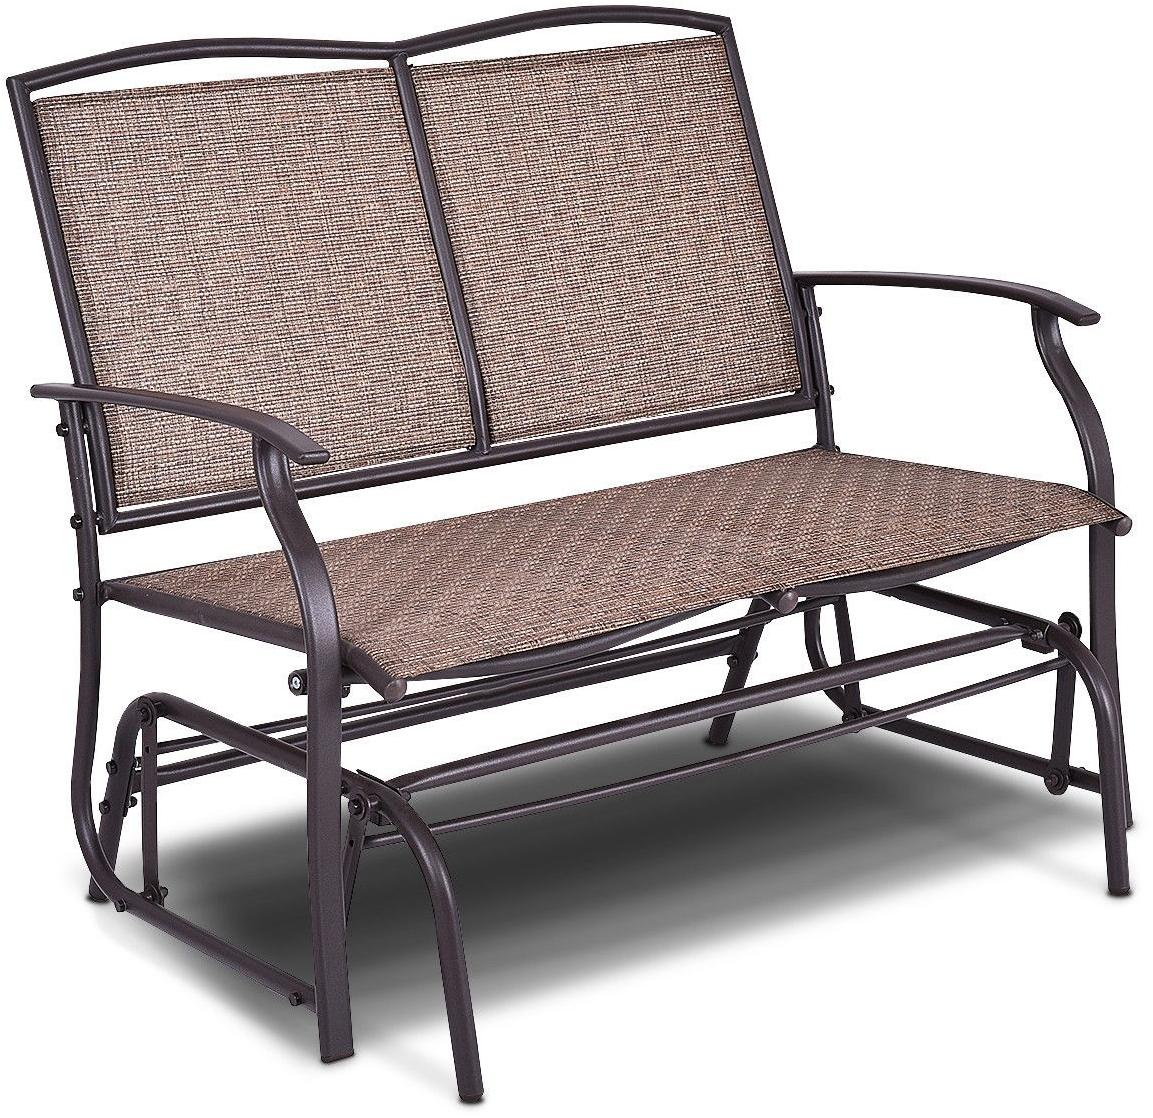 Details About Outdoor Swing Glider Chair Bench Garden Loveseat Backyard Garden Rocking Seat With Rocking Love Seats Glider Swing Benches With Sturdy Frame (View 4 of 25)